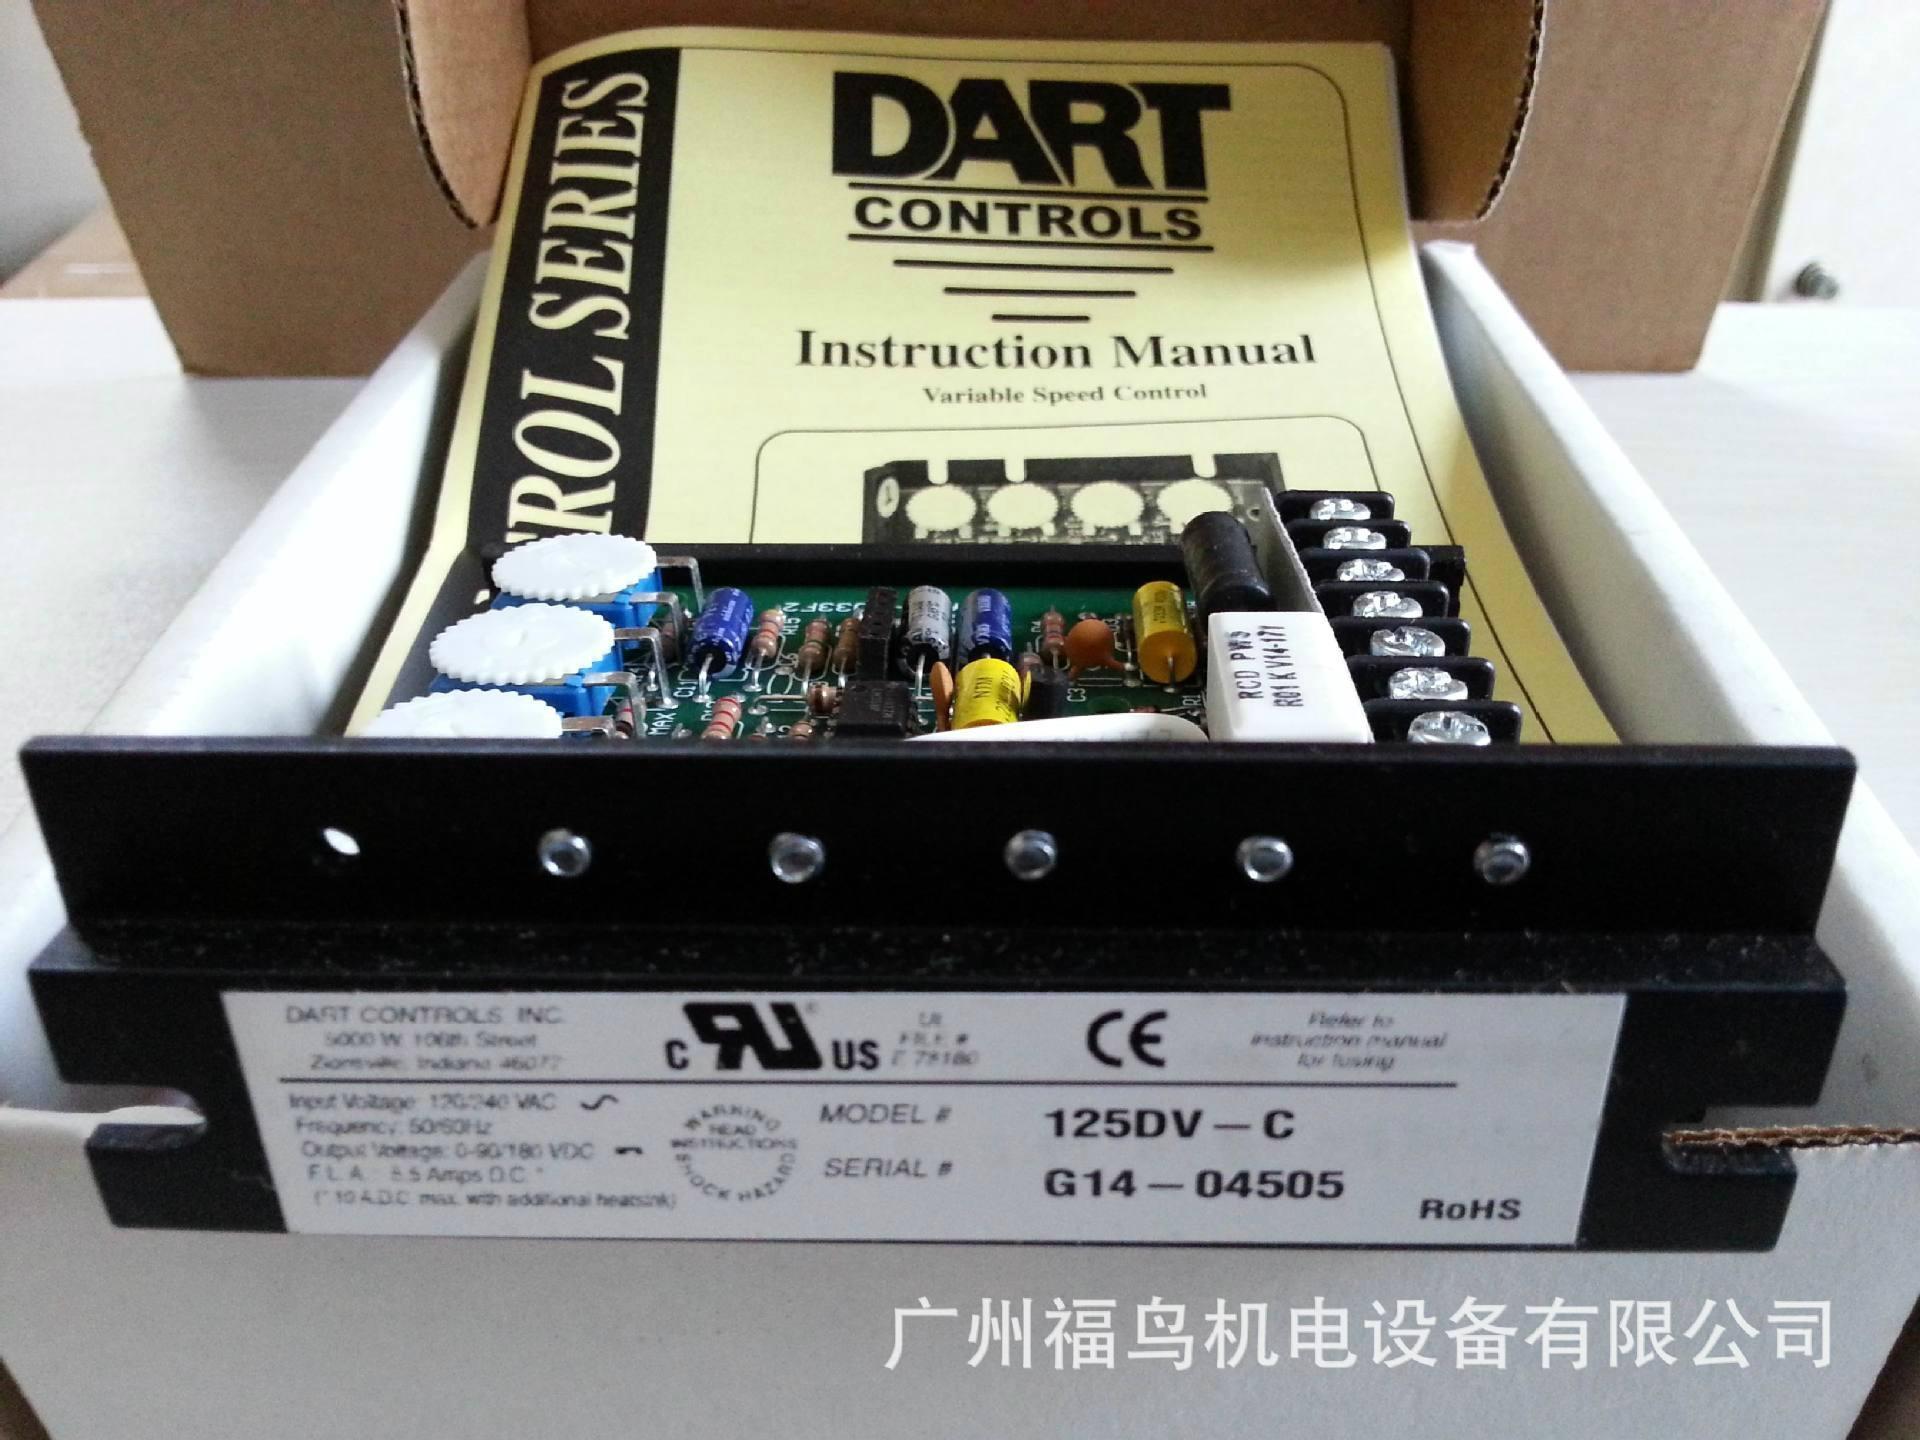 DART CONTROLS调速器, 型号: 125DV-C